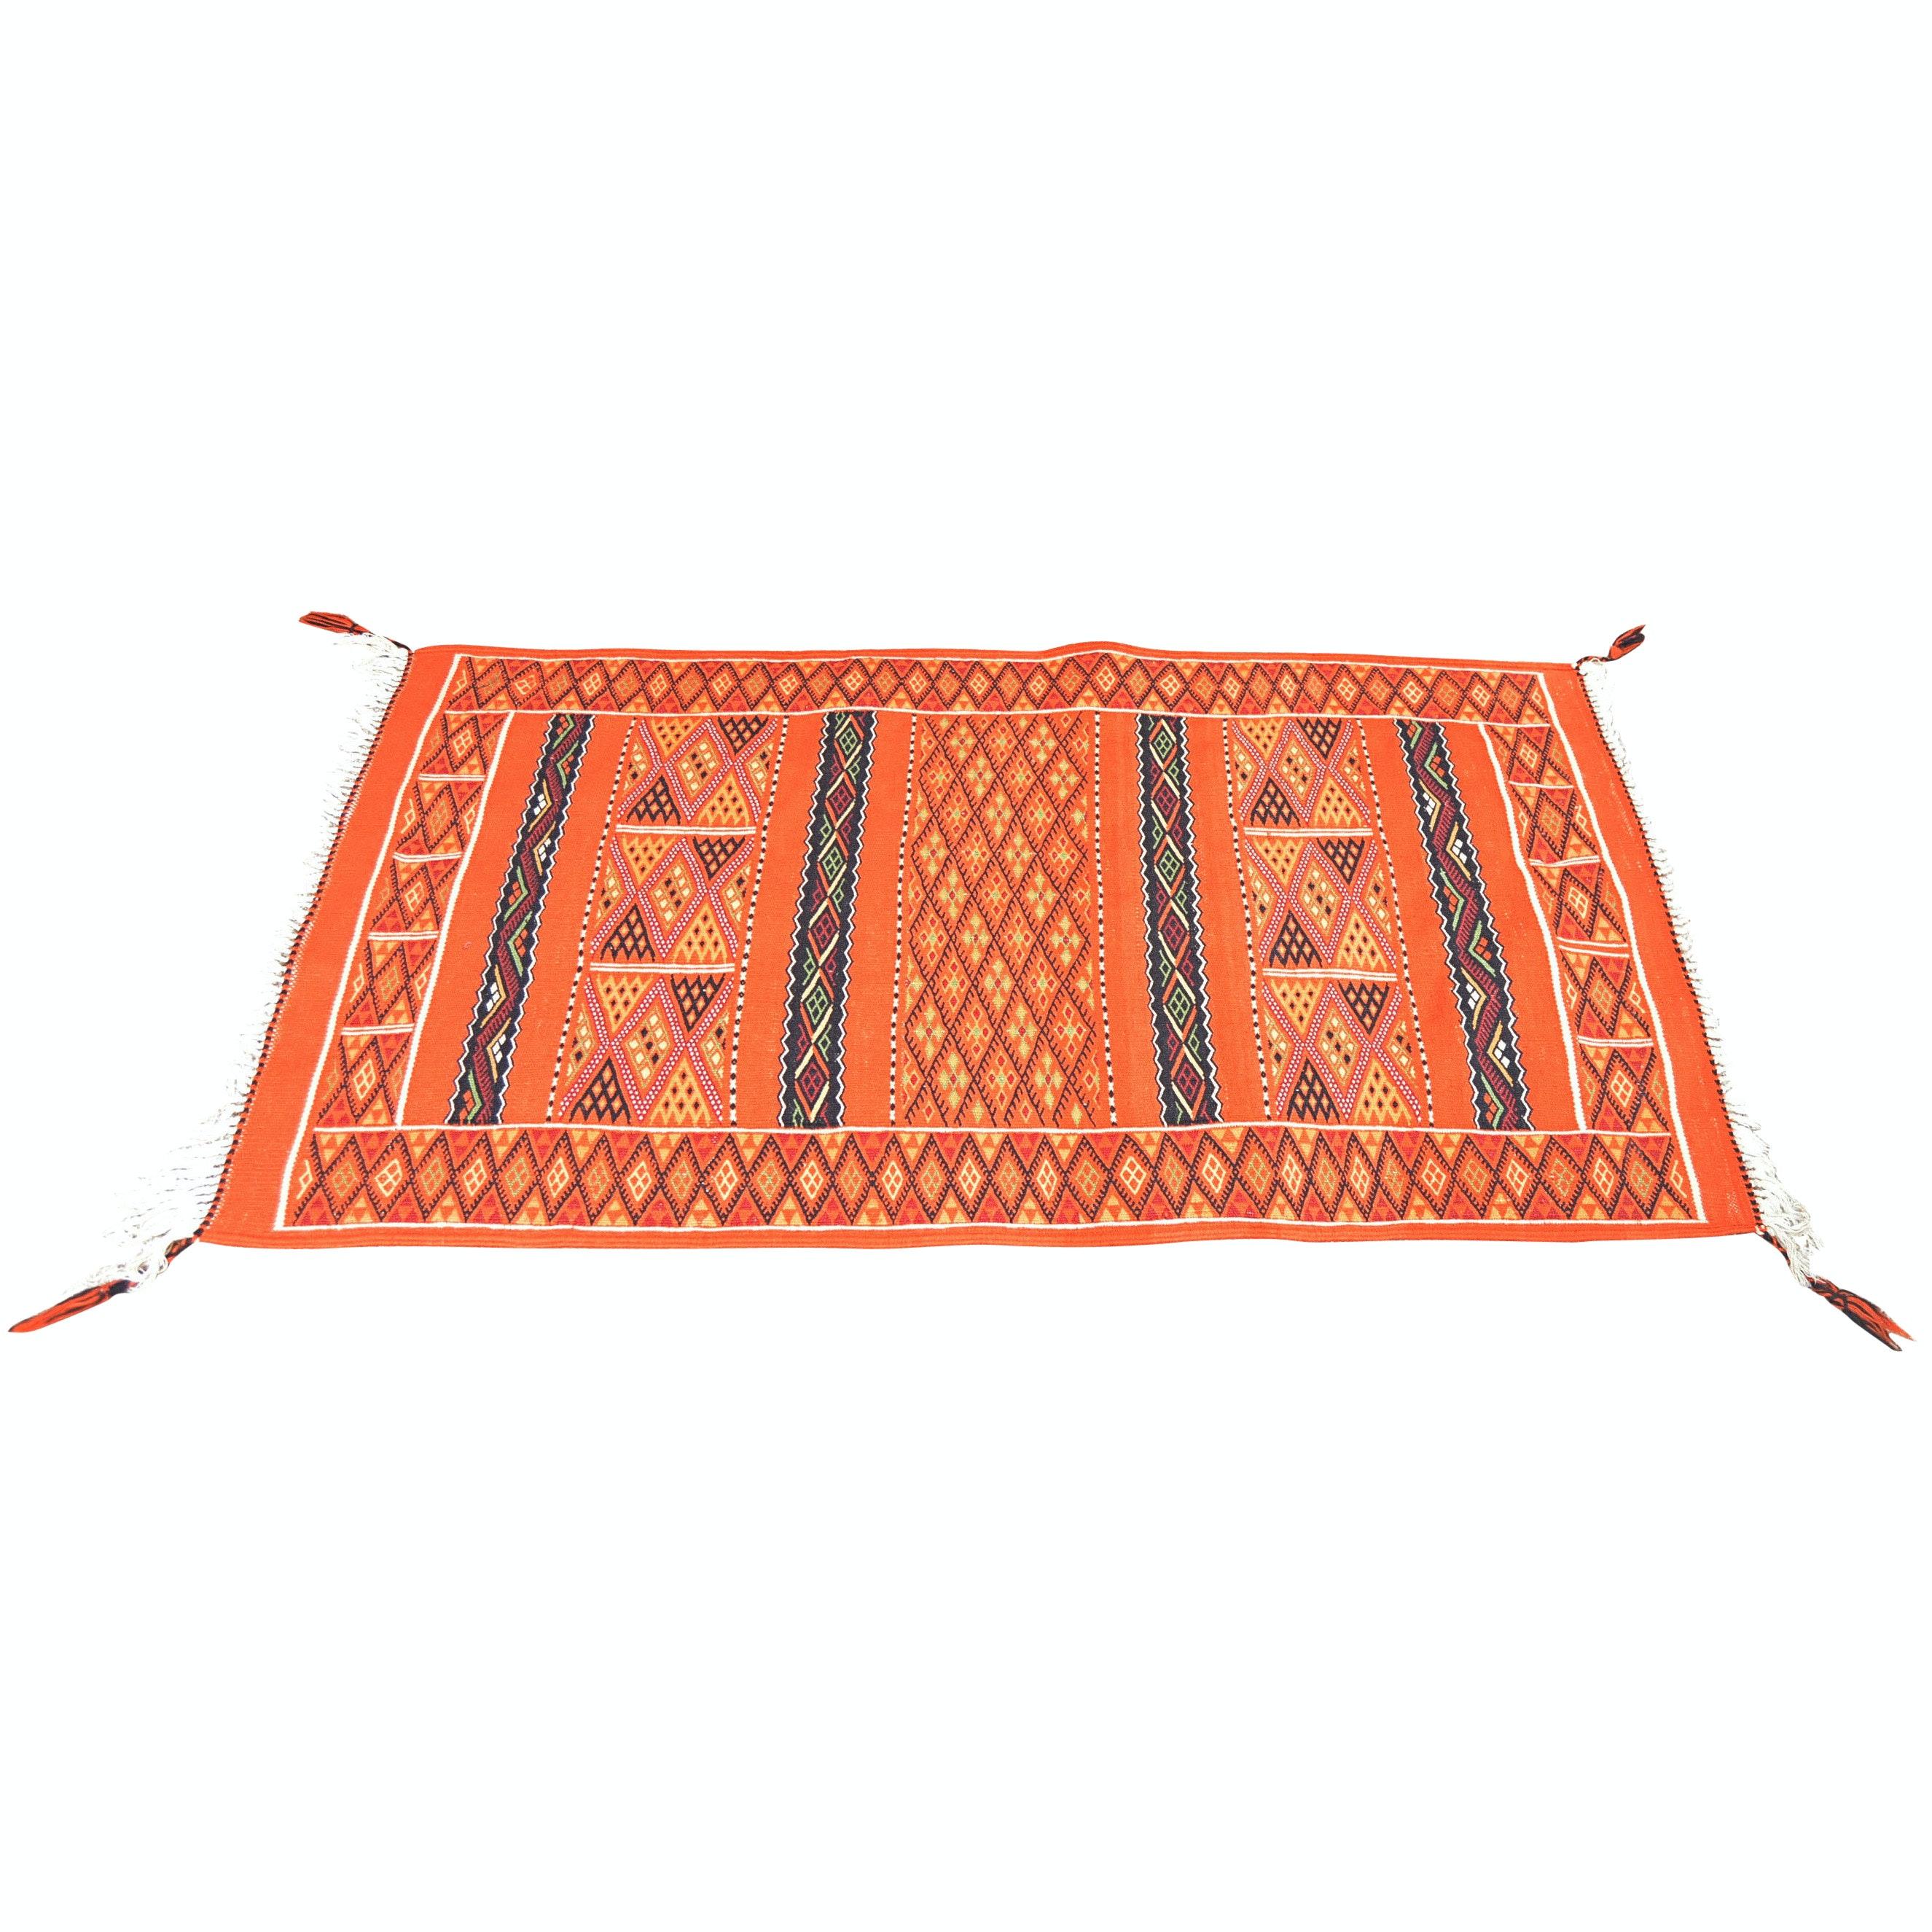 Handwoven Ghardaia Algerian Berber Wool Accent Rug